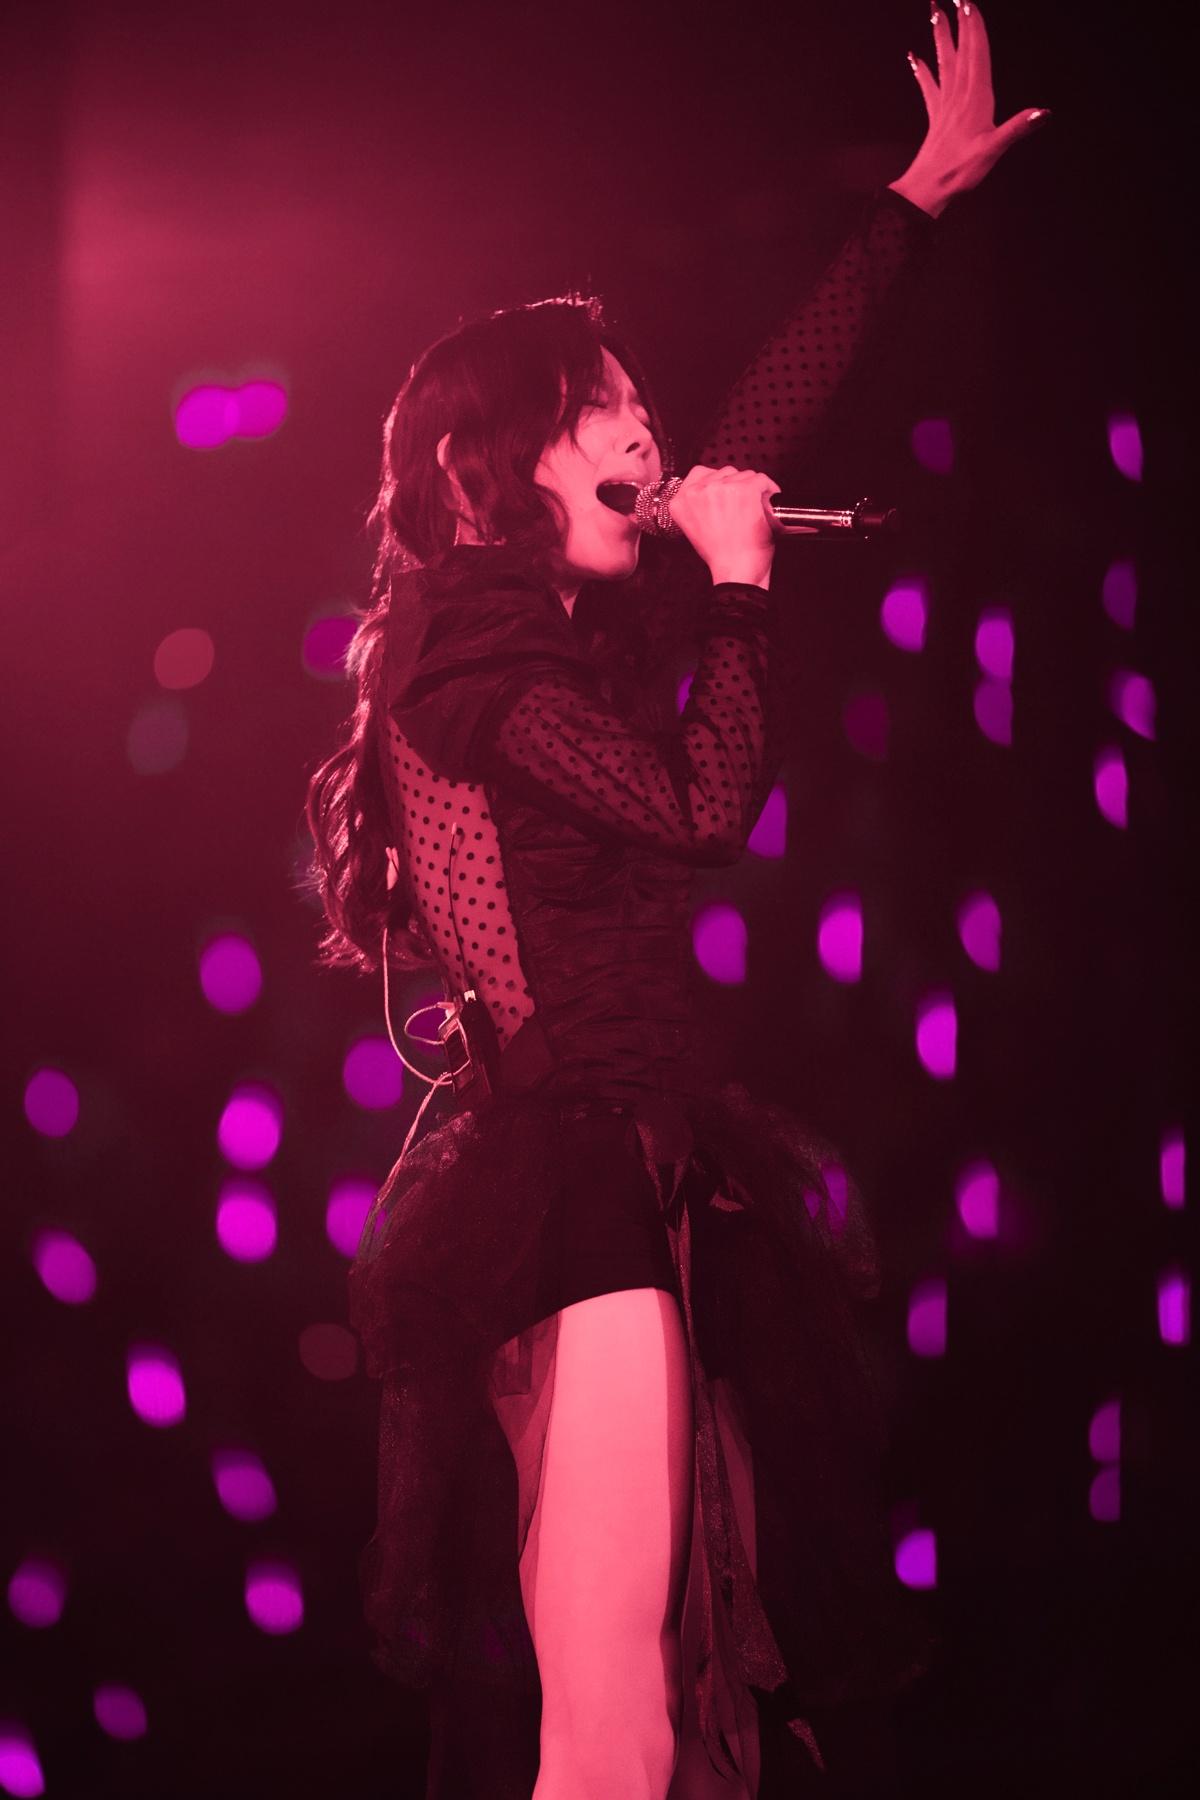 https://i1.wp.com/cdn.koreaboo.com/wp-content/uploads/2017/06/Taeyeon3-1.jpg